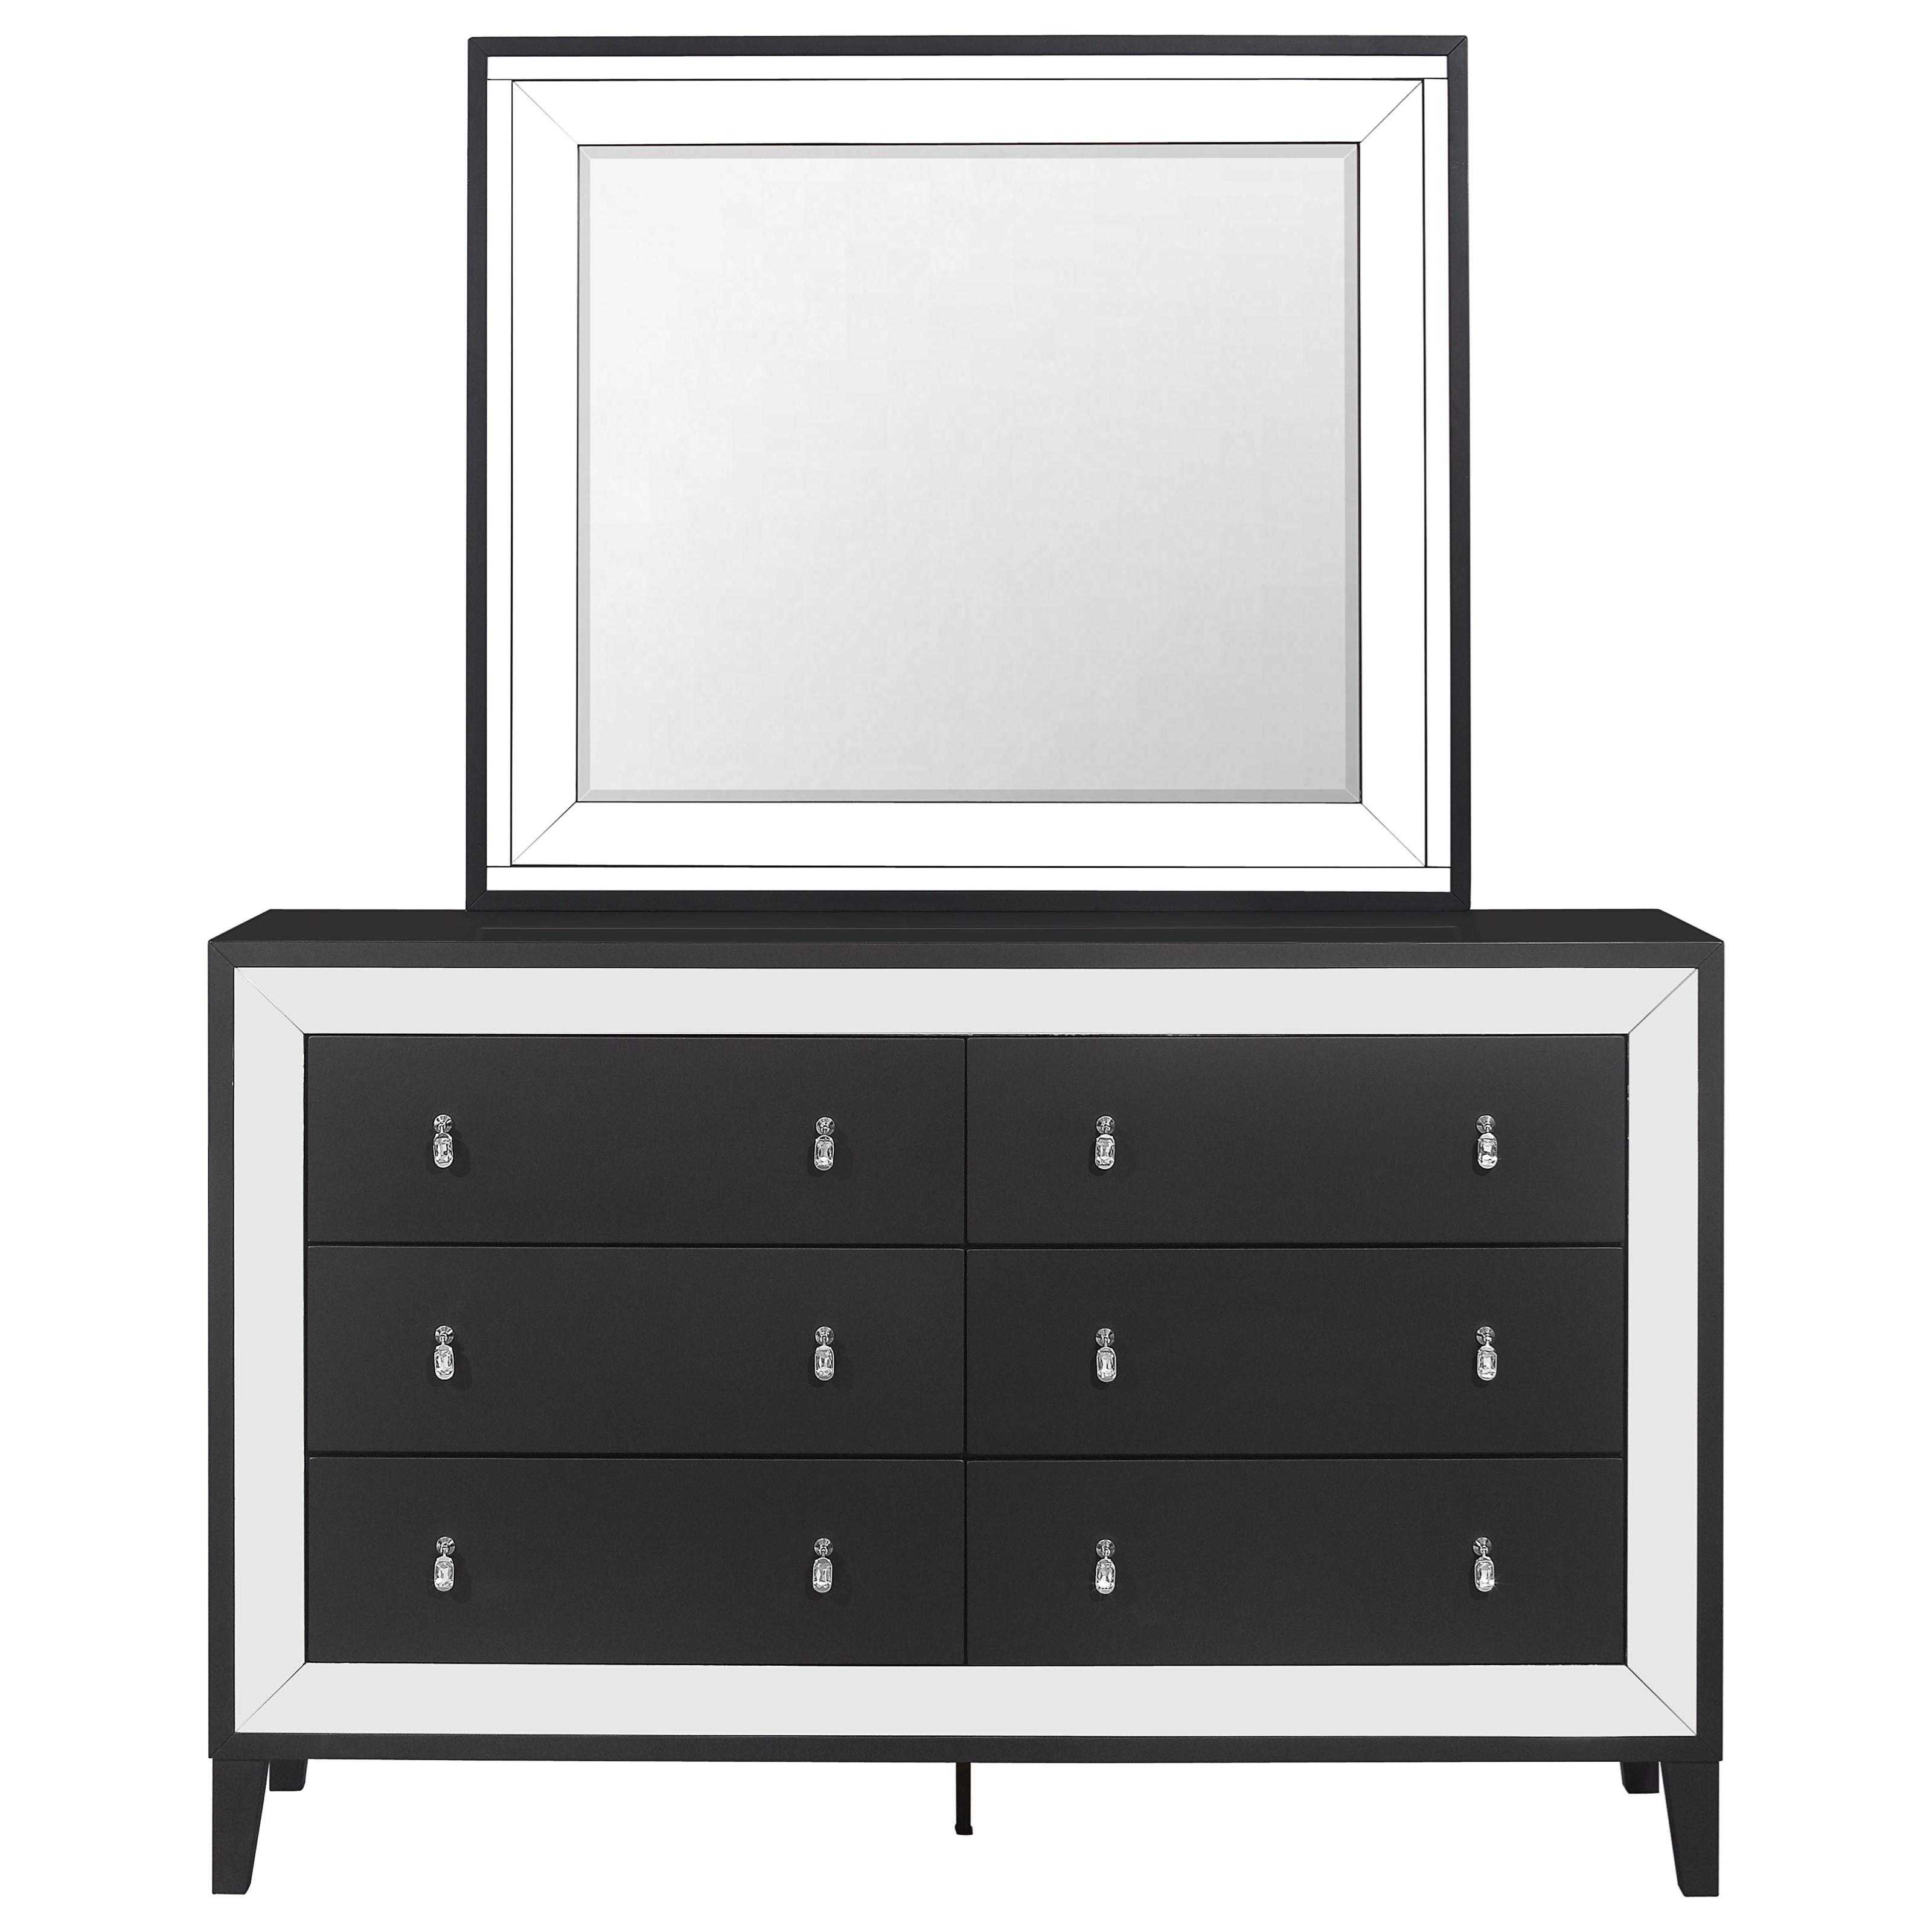 Catania Dresser and Mirror Set by Global Furniture at Nassau Furniture and Mattress